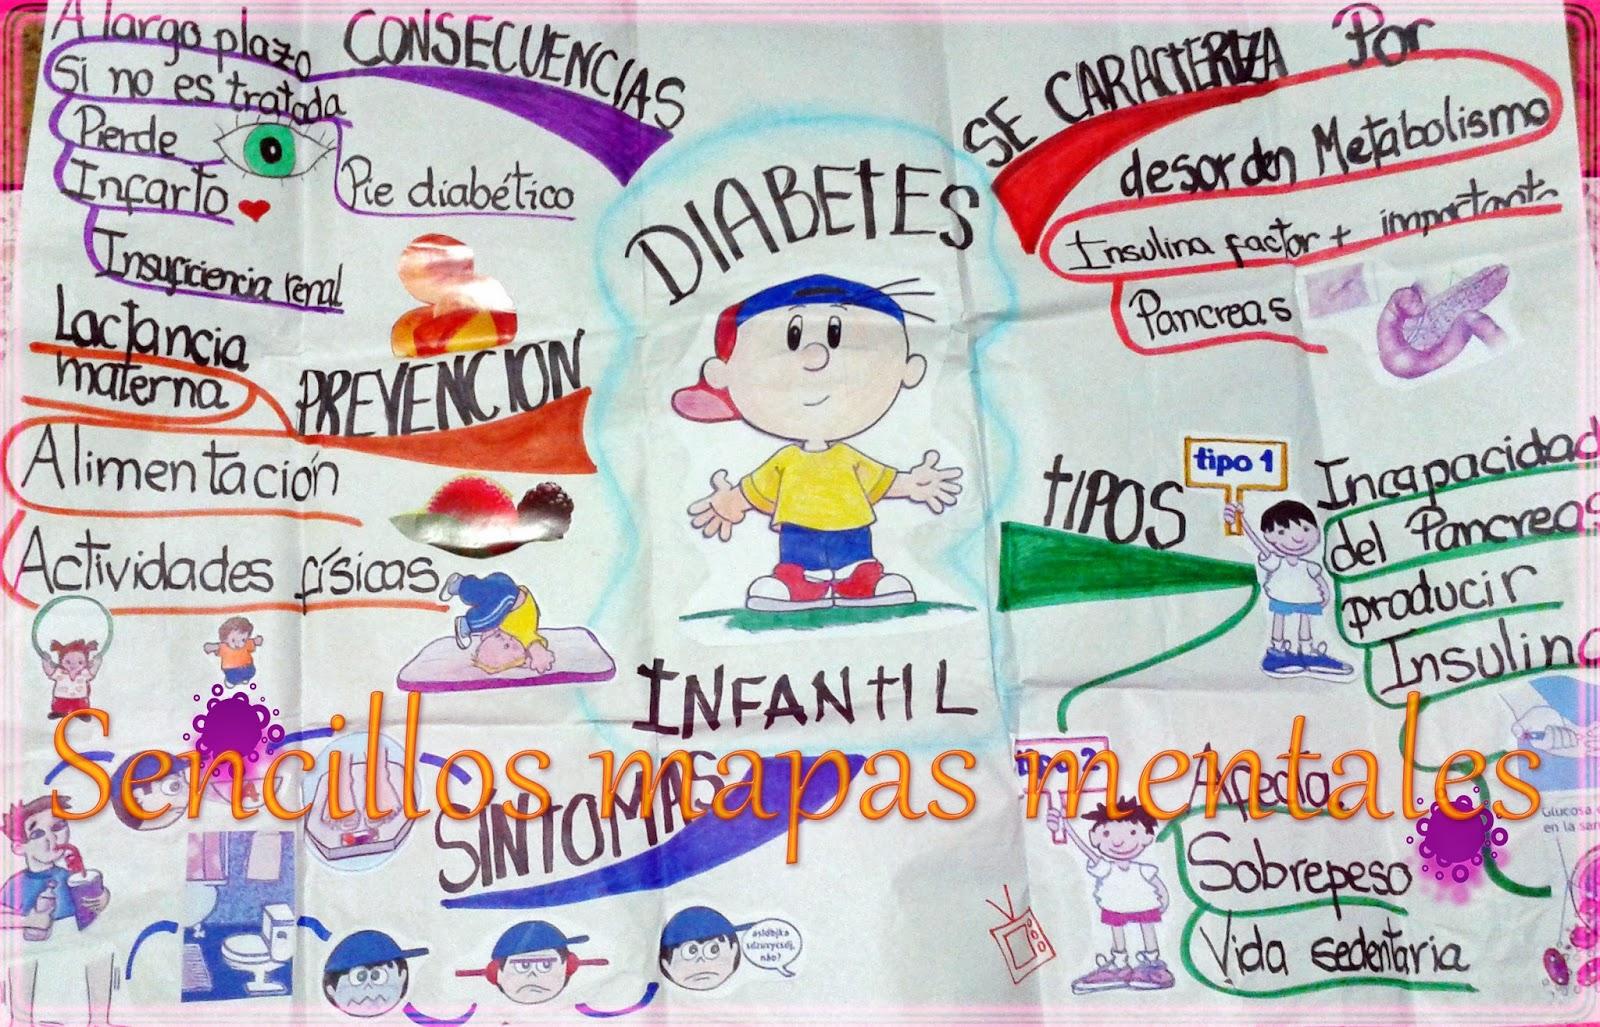 Libreta De Dibujo Con Dibujos Infant: Sencillos Mapas Mentales